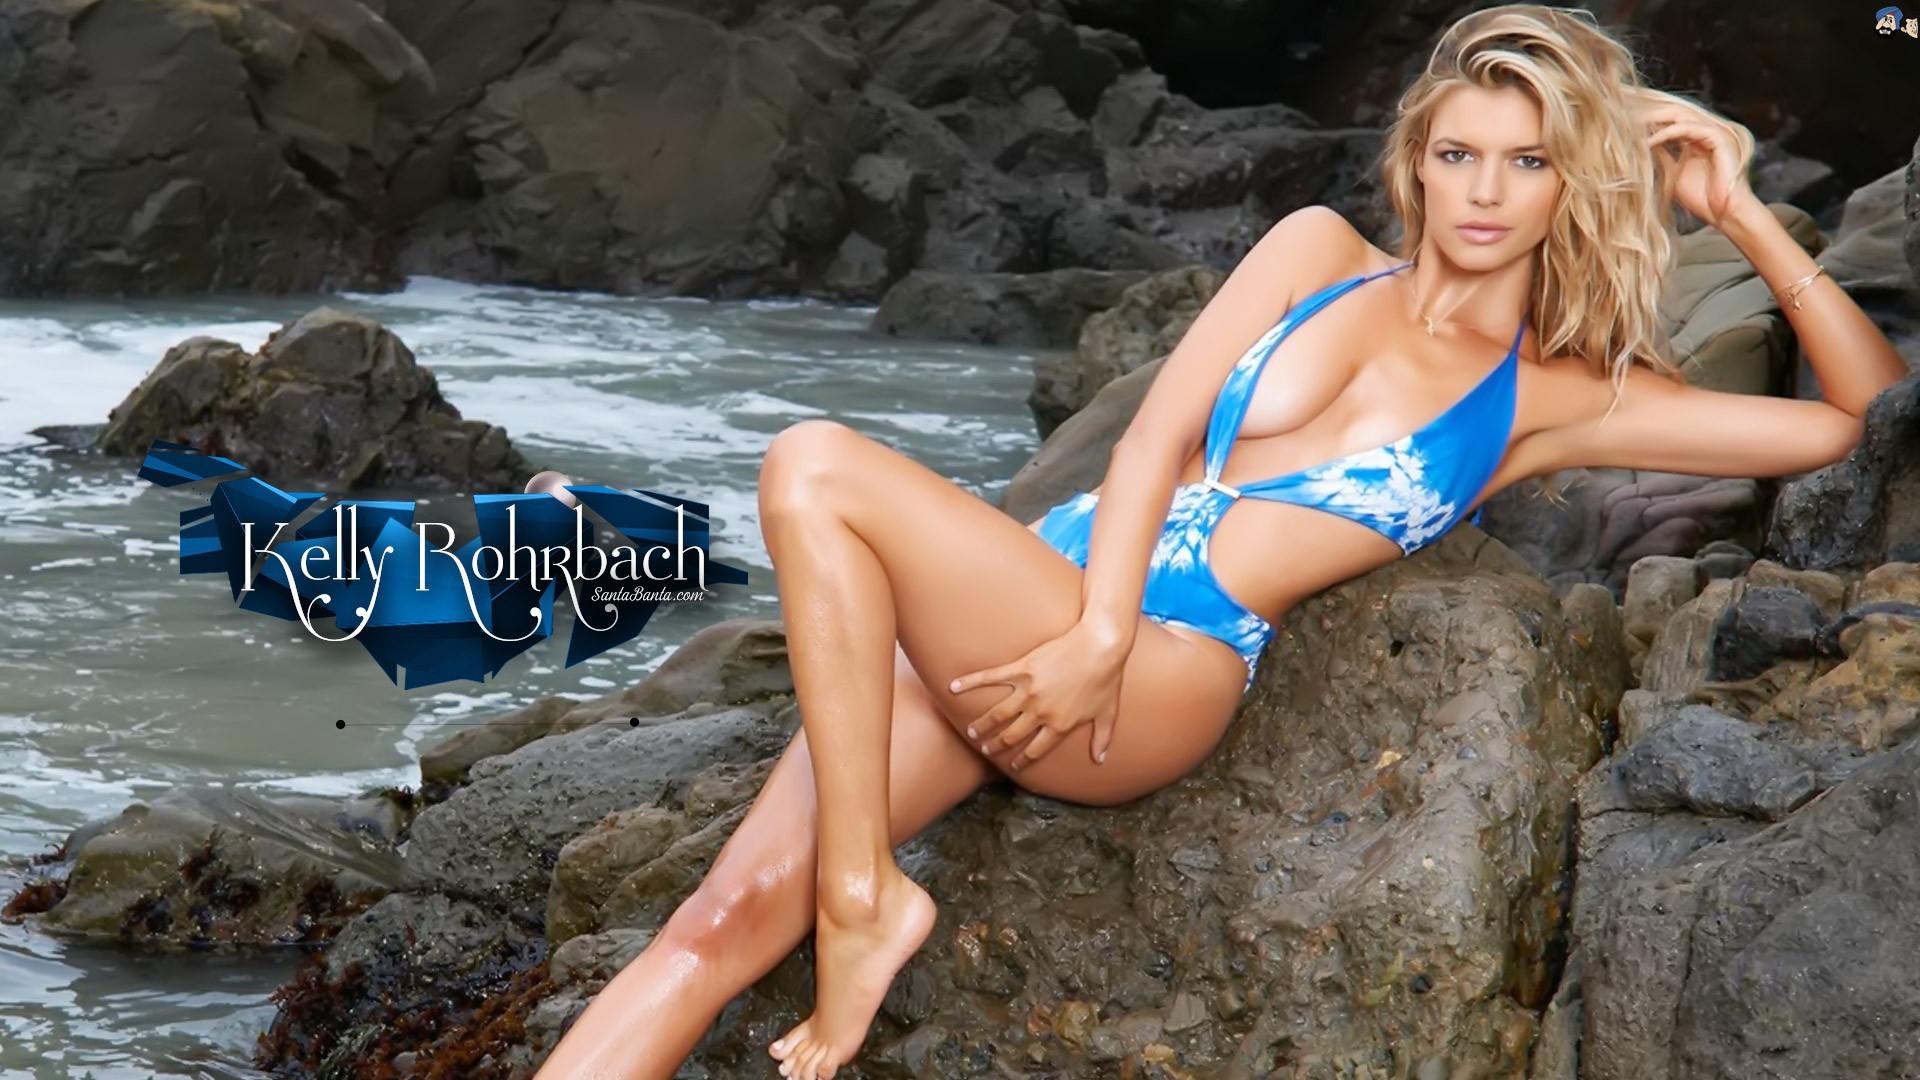 Kelly Rohrbach Photos